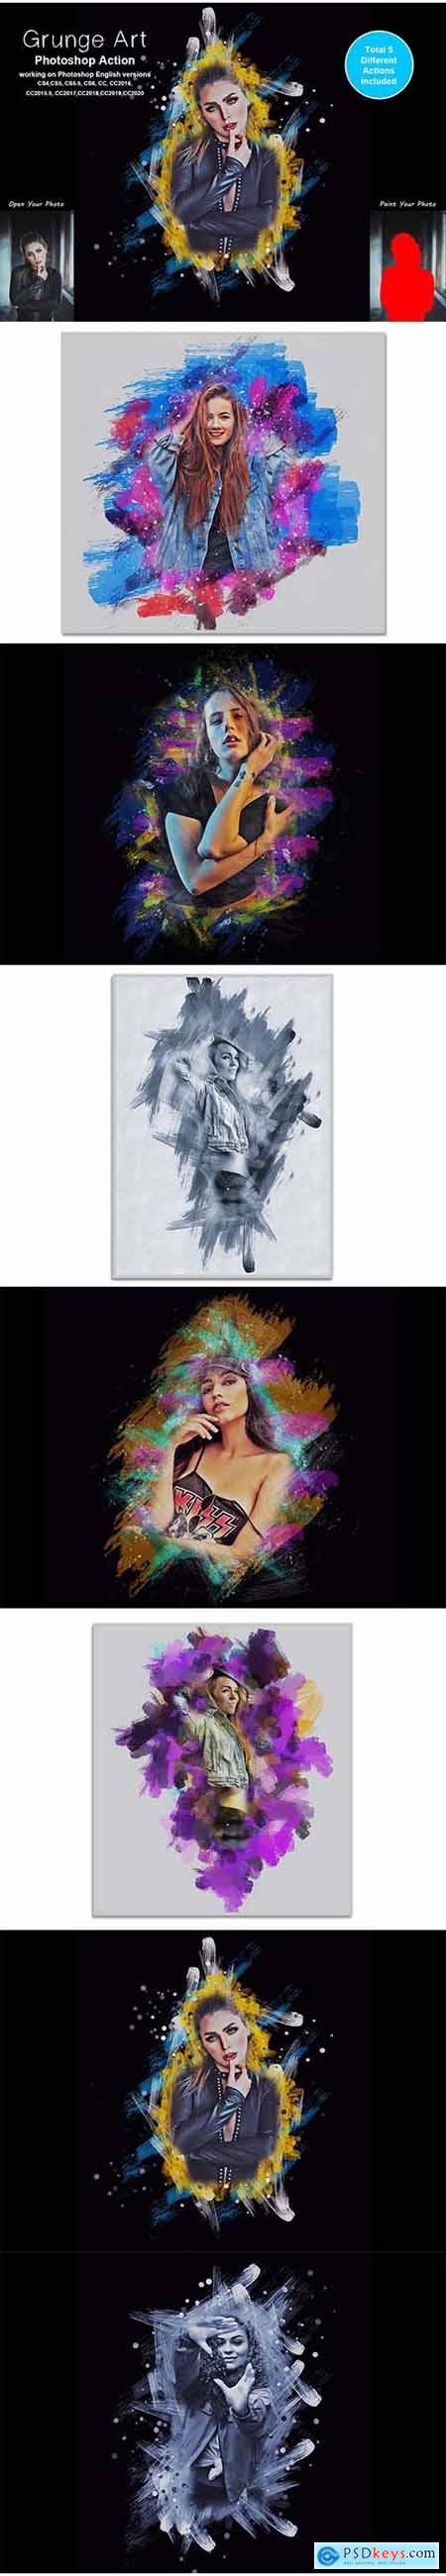 Grunge Art Photoshop Action 5442223